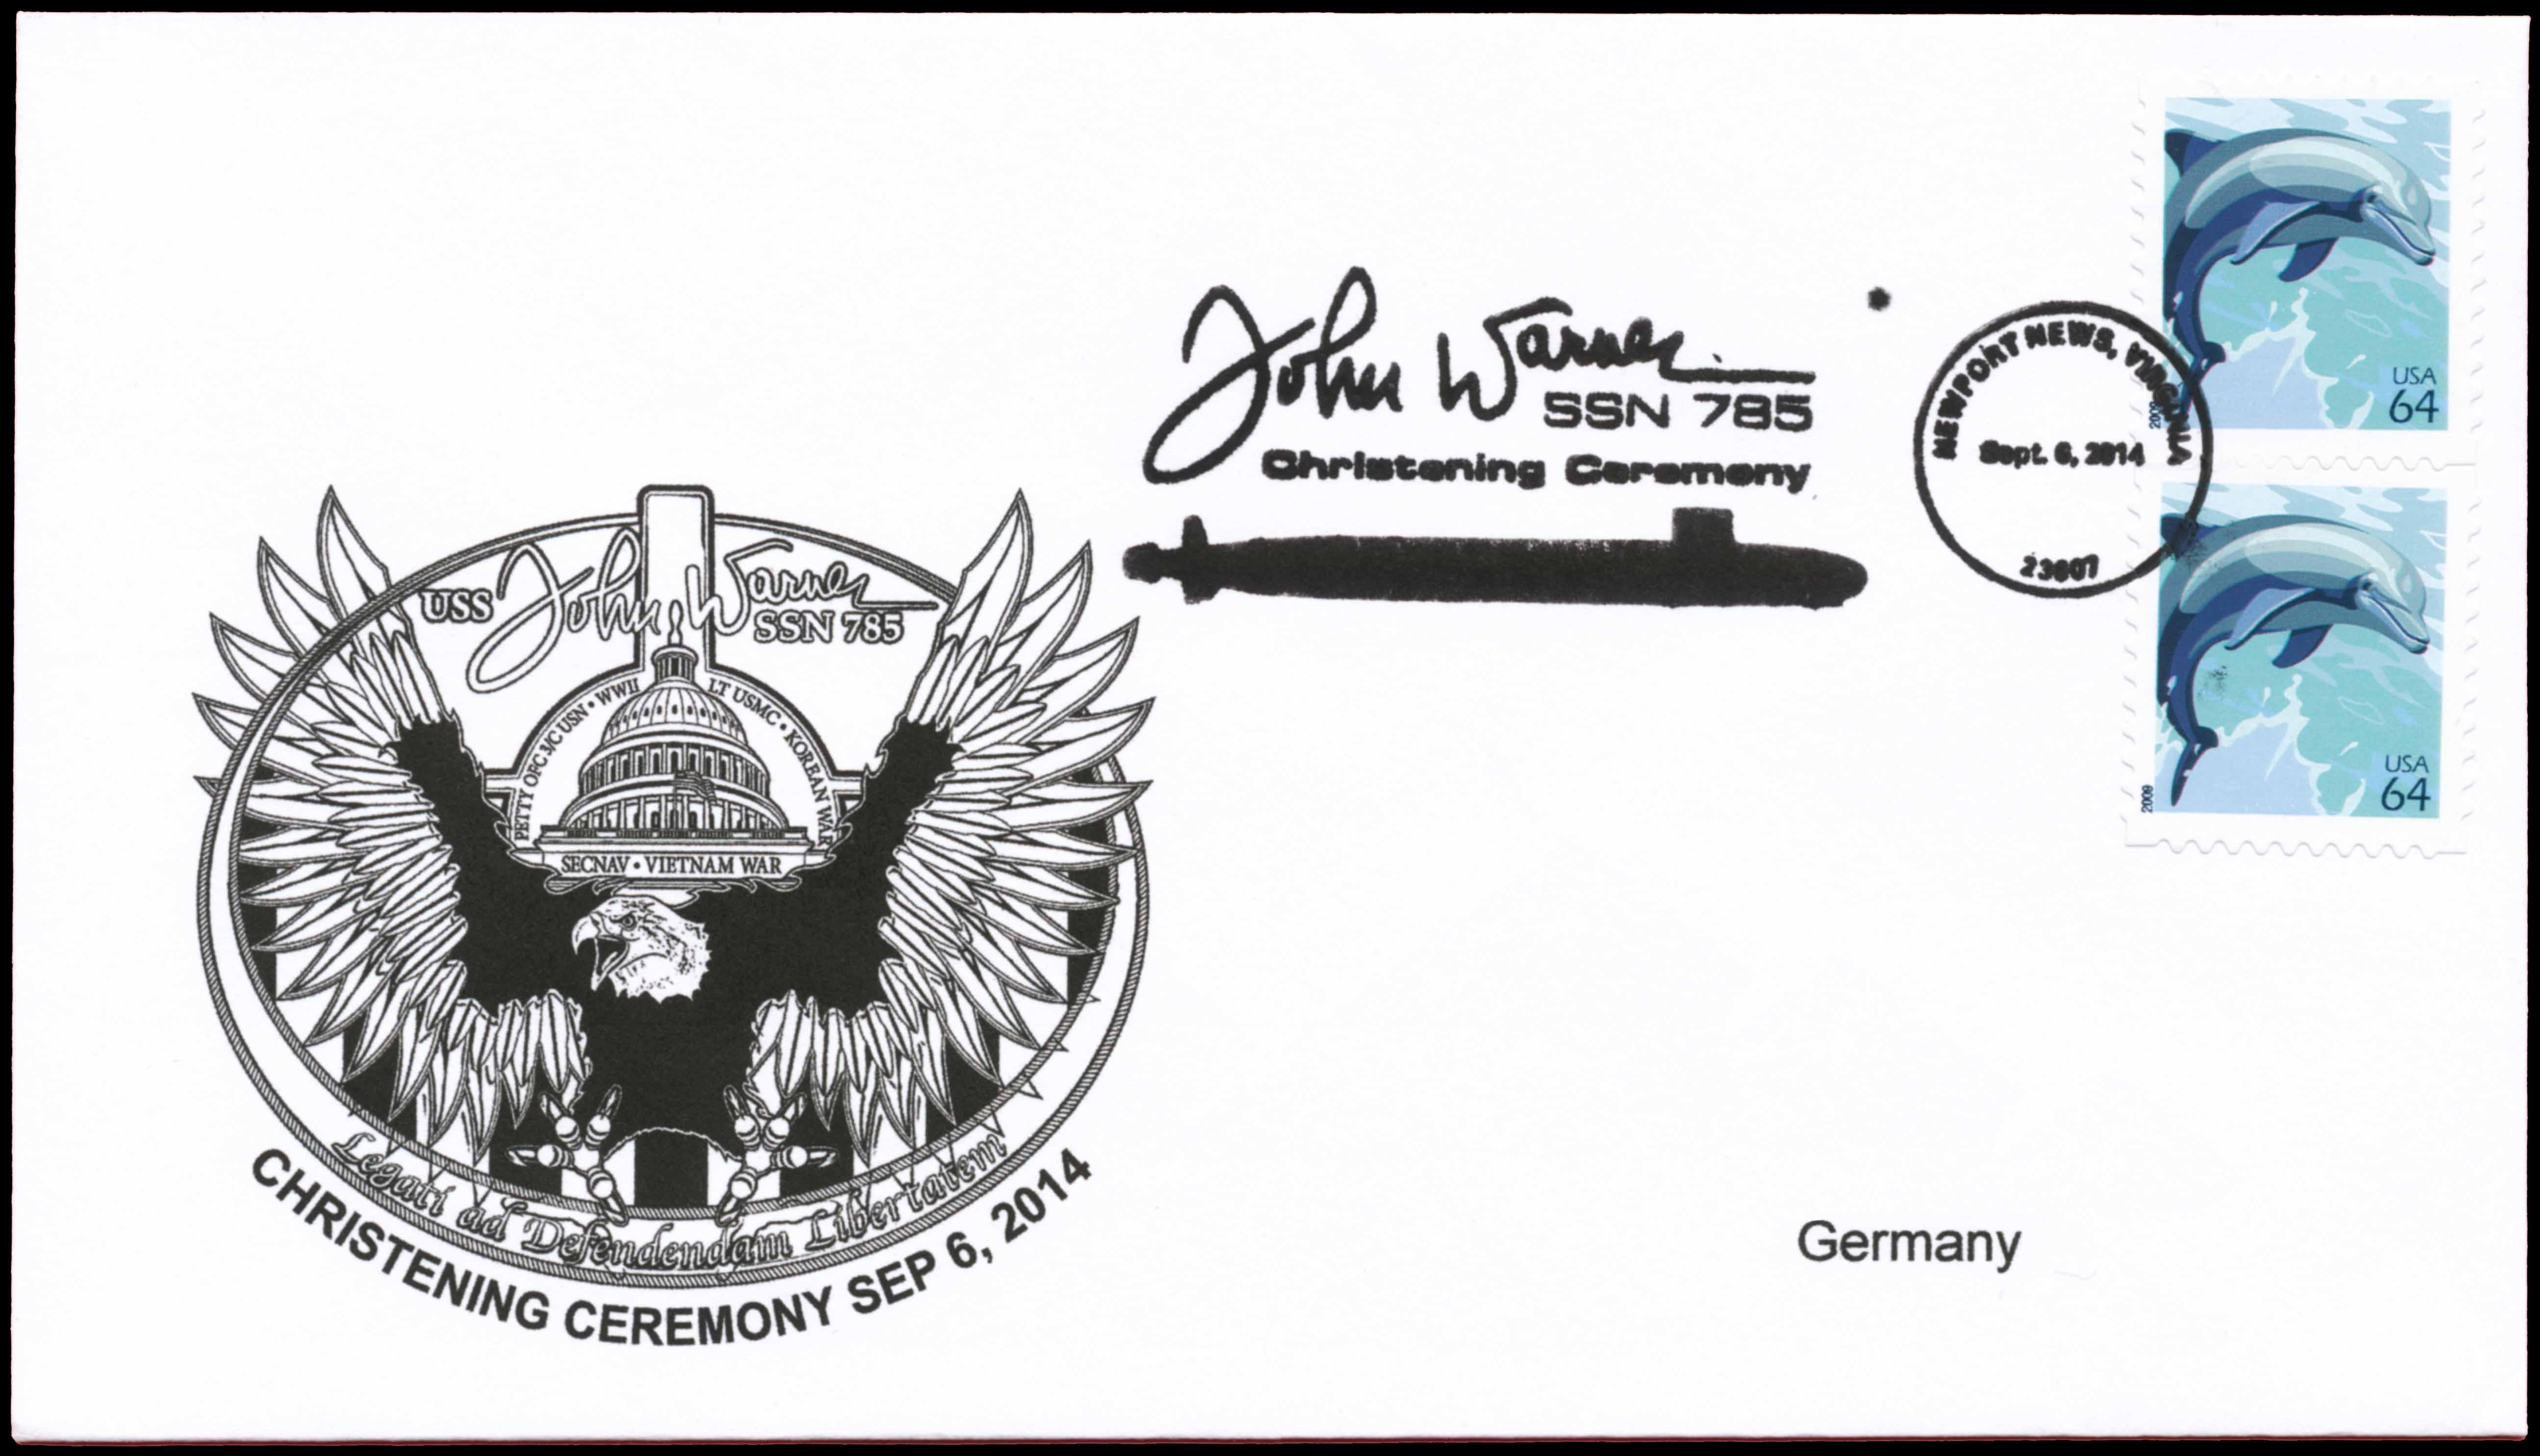 Beleg USS JOHN WARNER SSN-785 Christening von Wolfgang Hechler